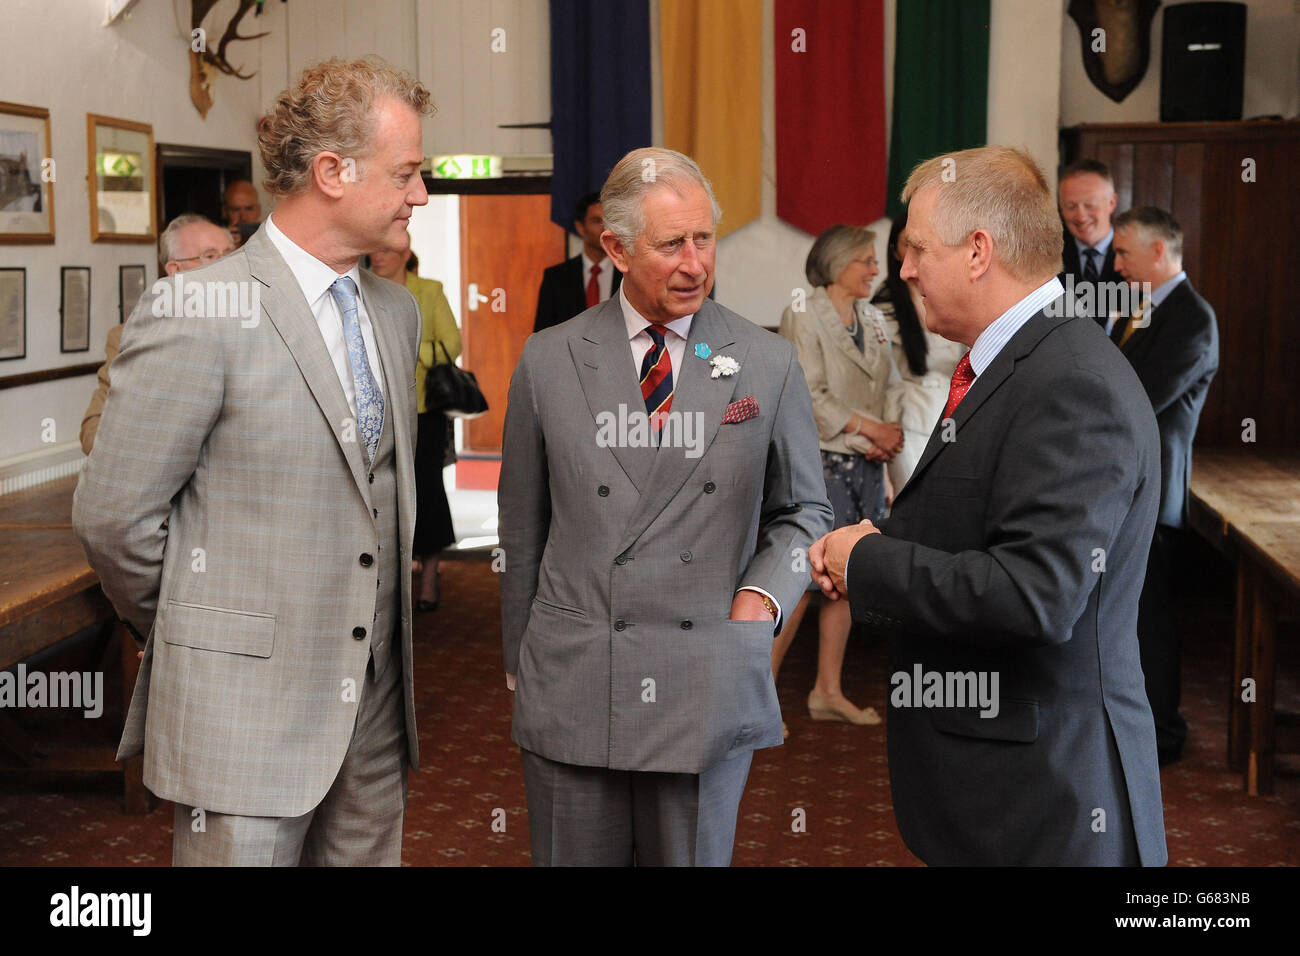 Royal visit to Wales - Day 5 - Stock Image